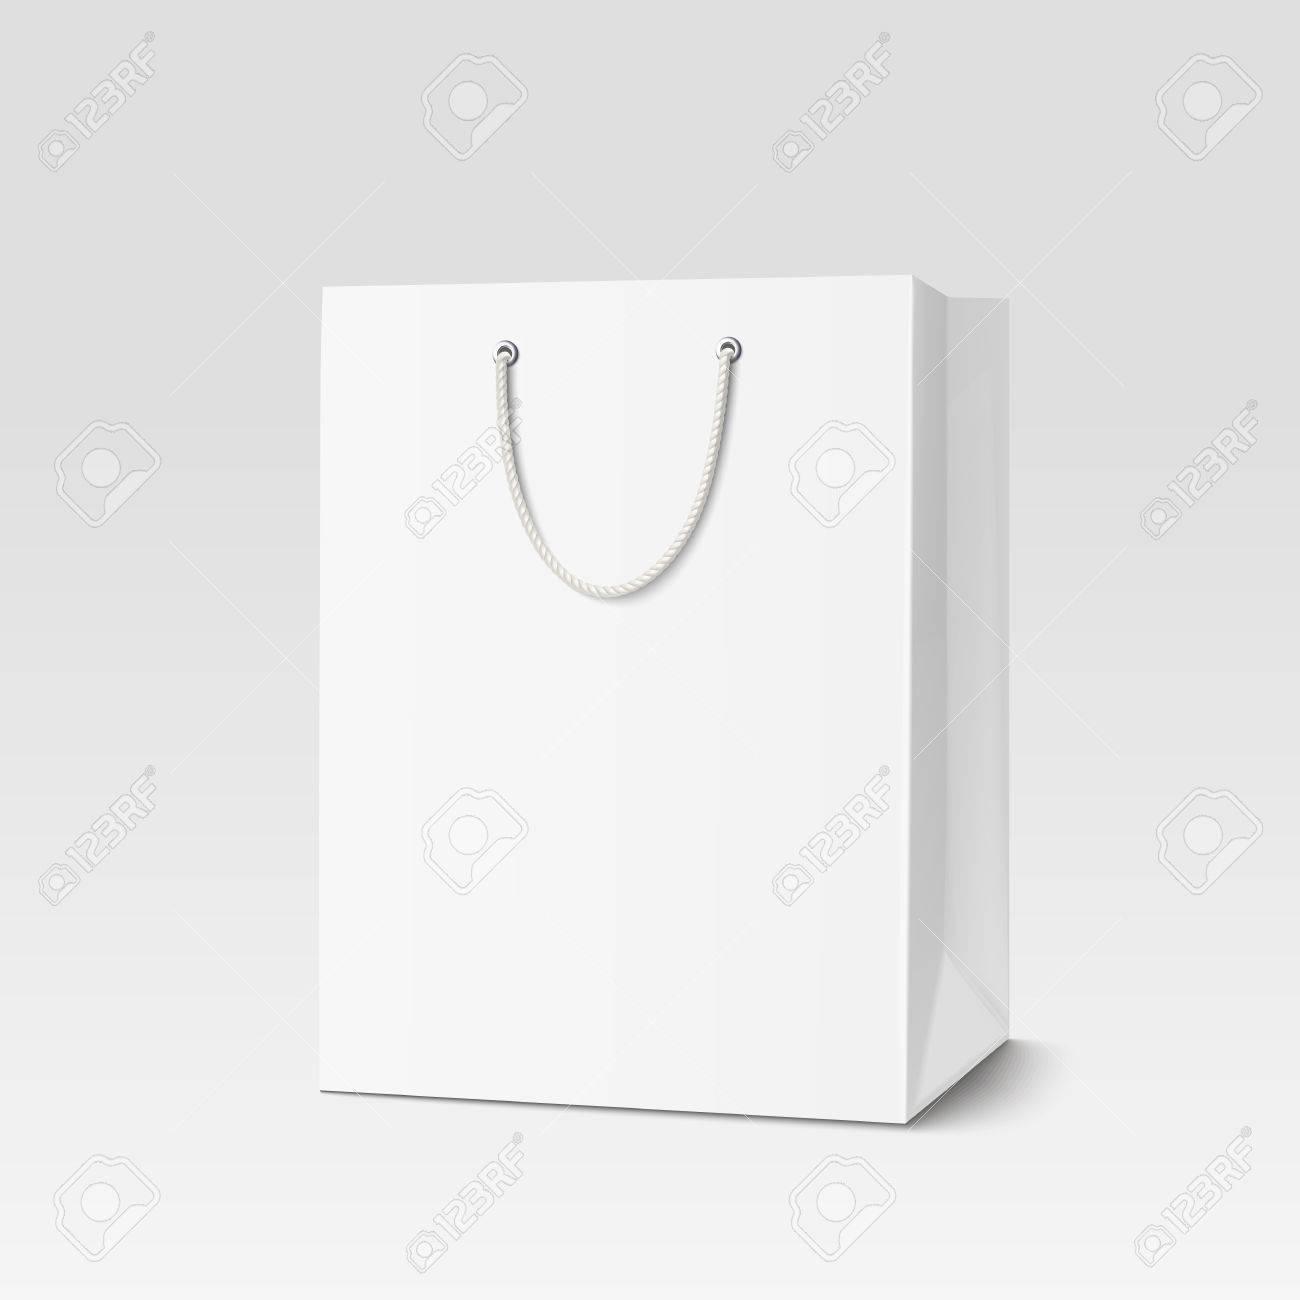 Shopping paper bag. - 54017607